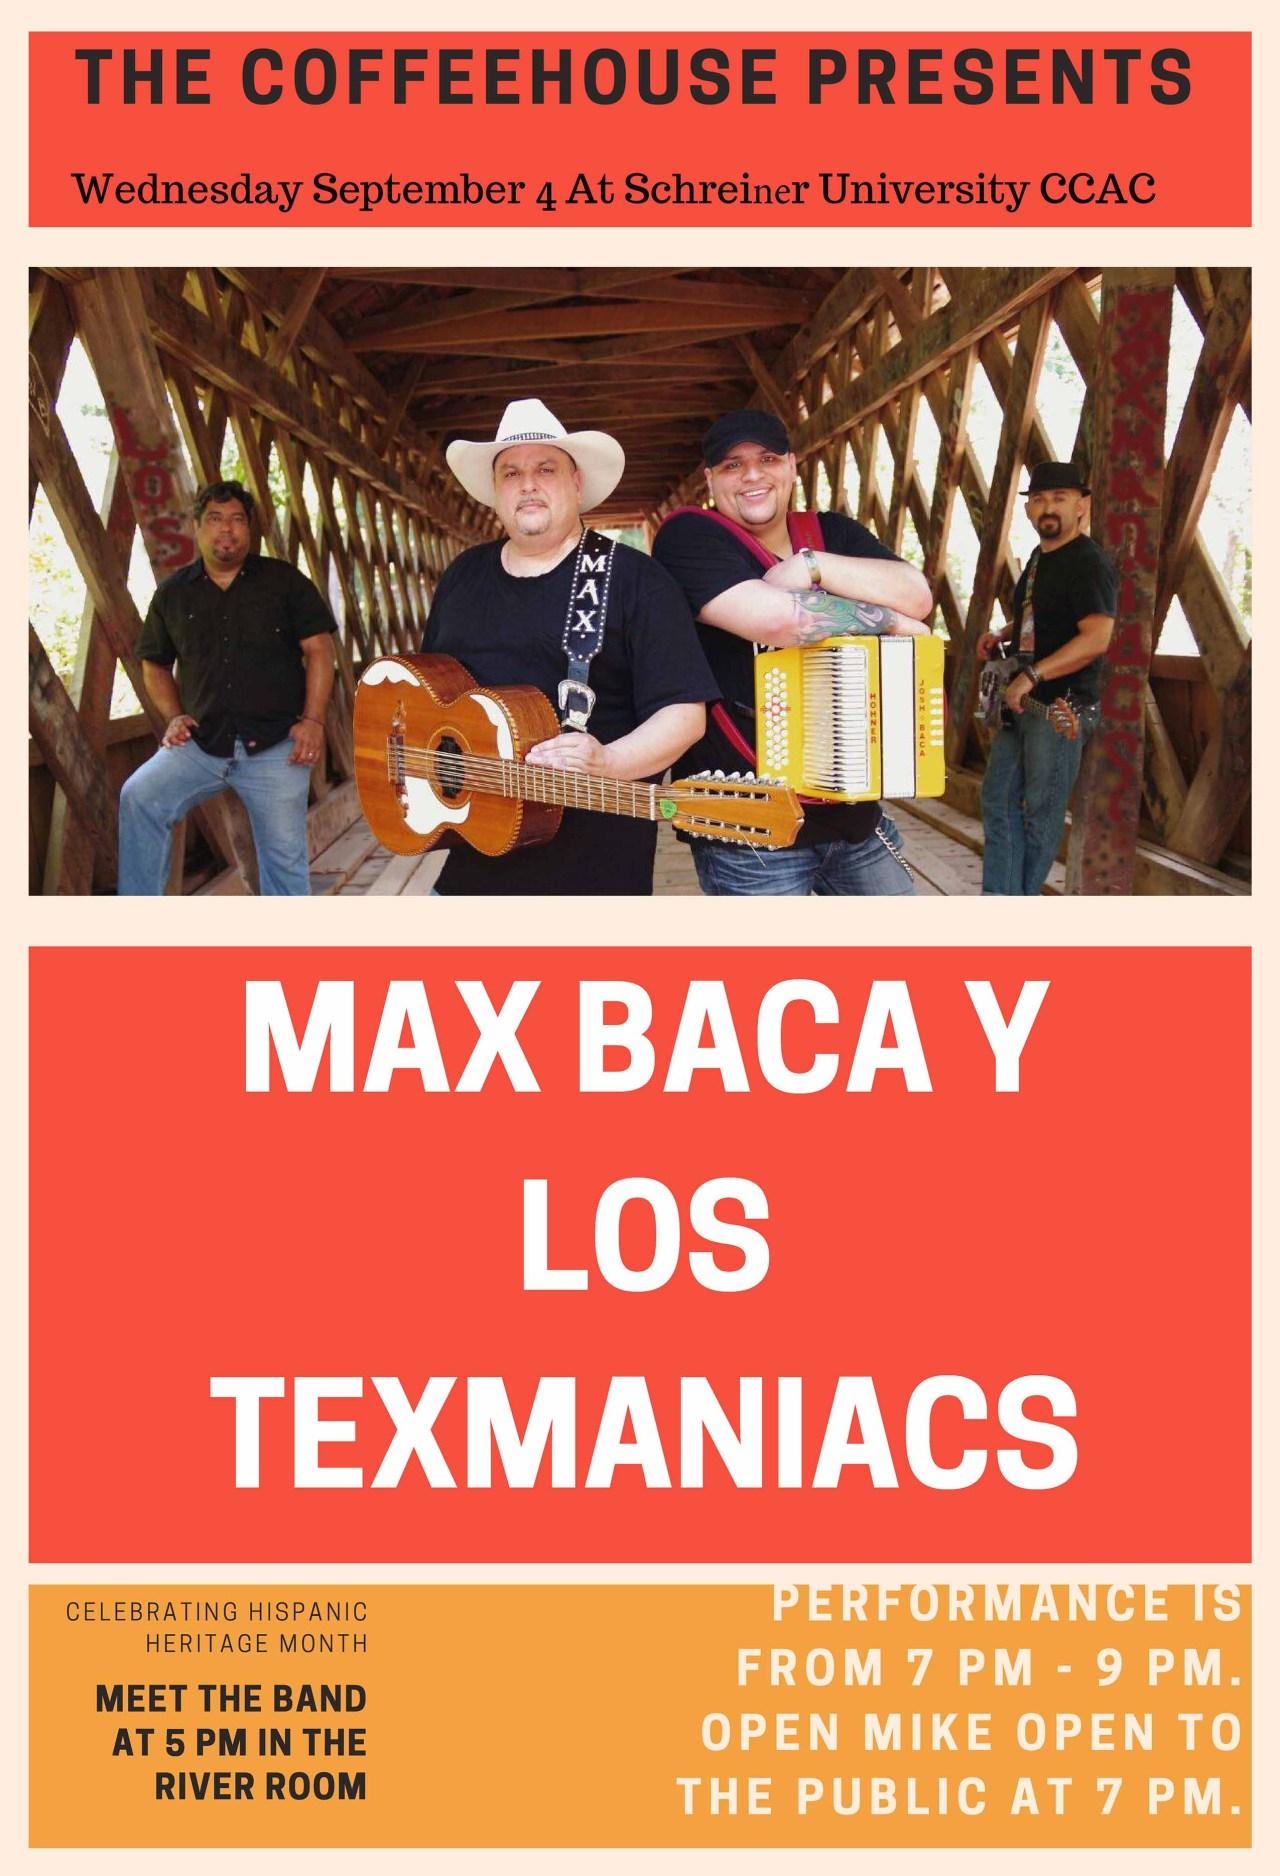 Max Baca Y Los Texmaniacs